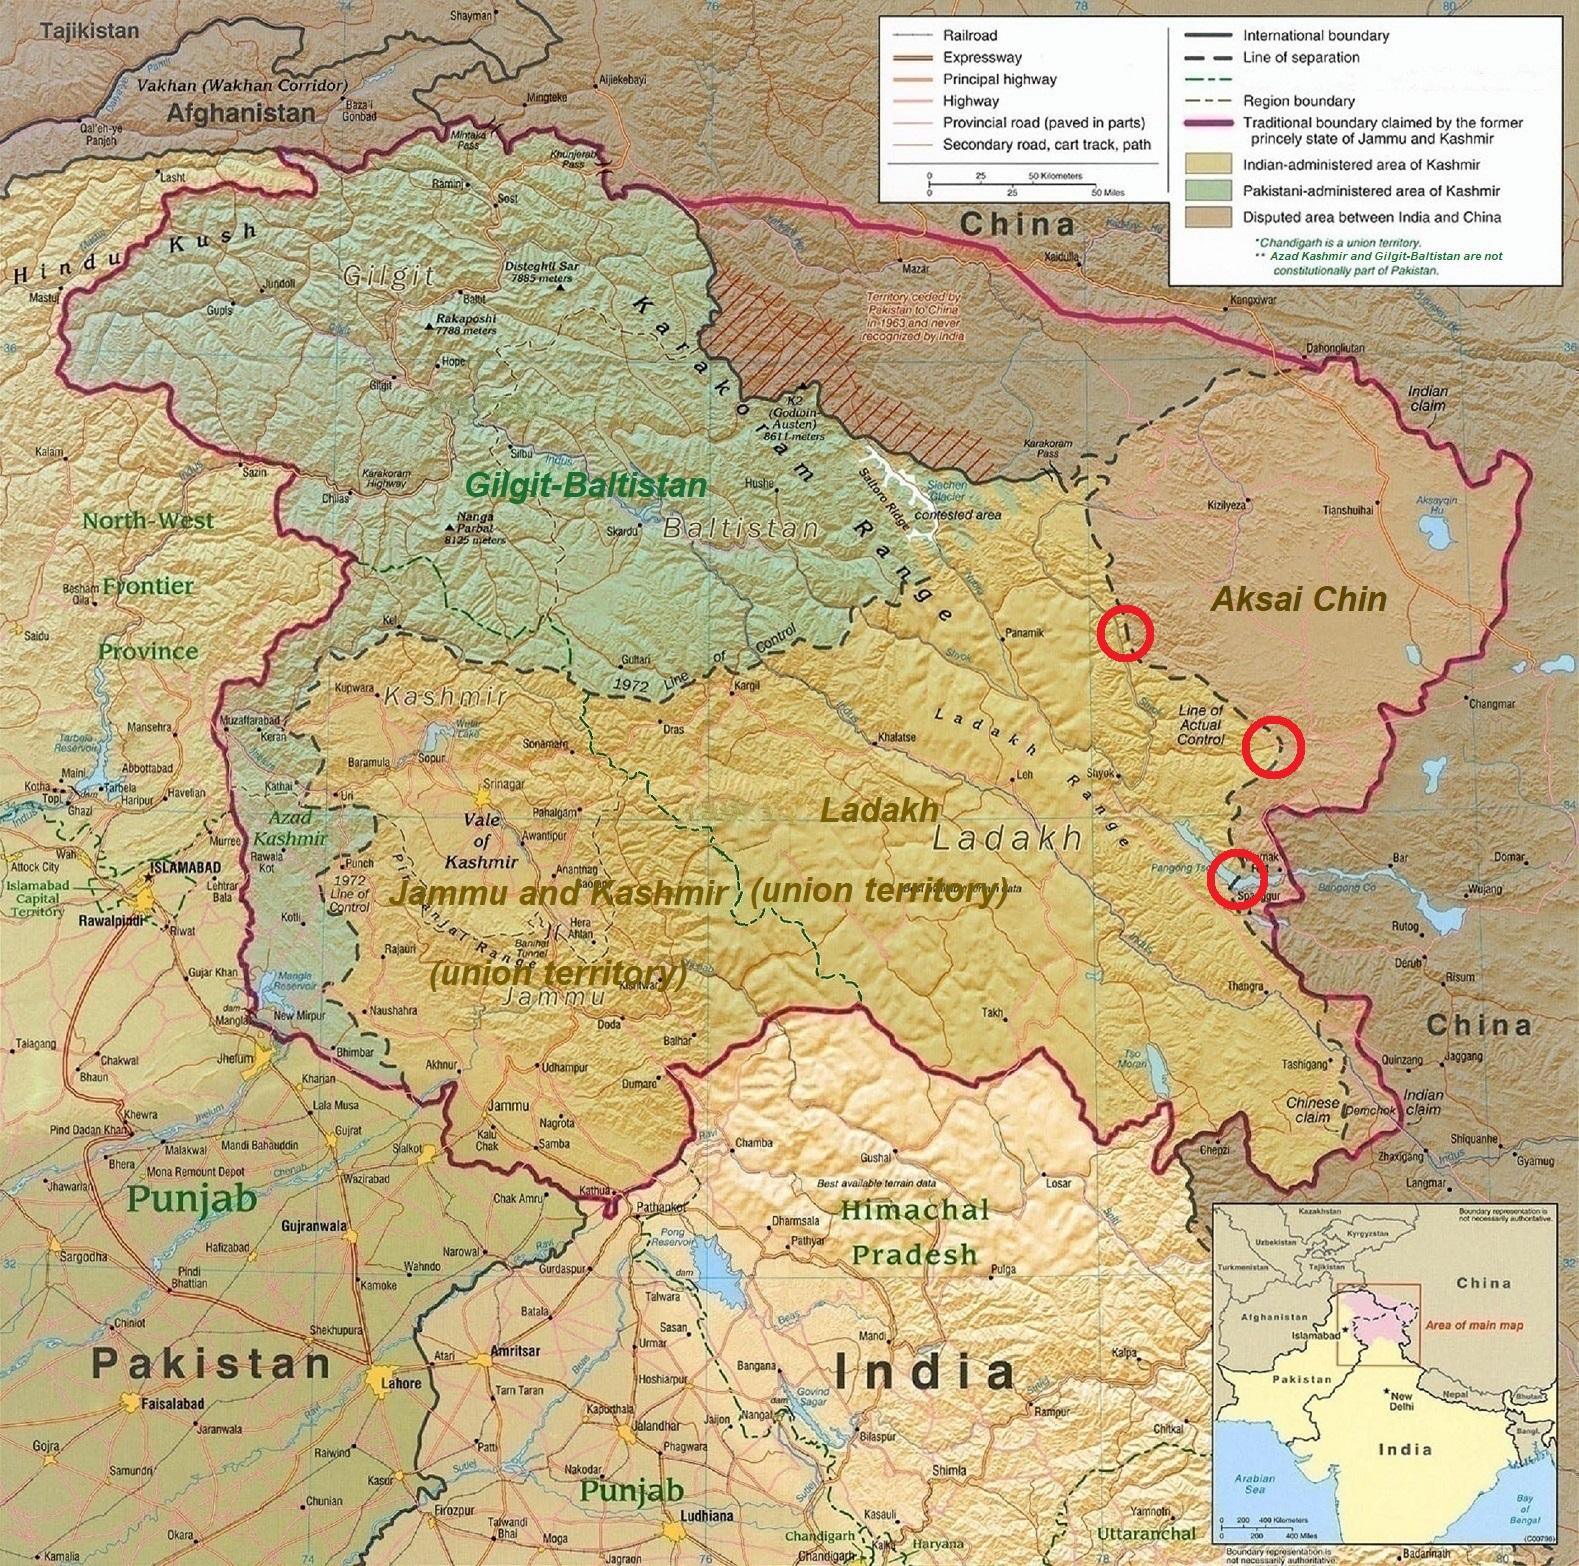 2020 China–India skirmishes - Wikipedia